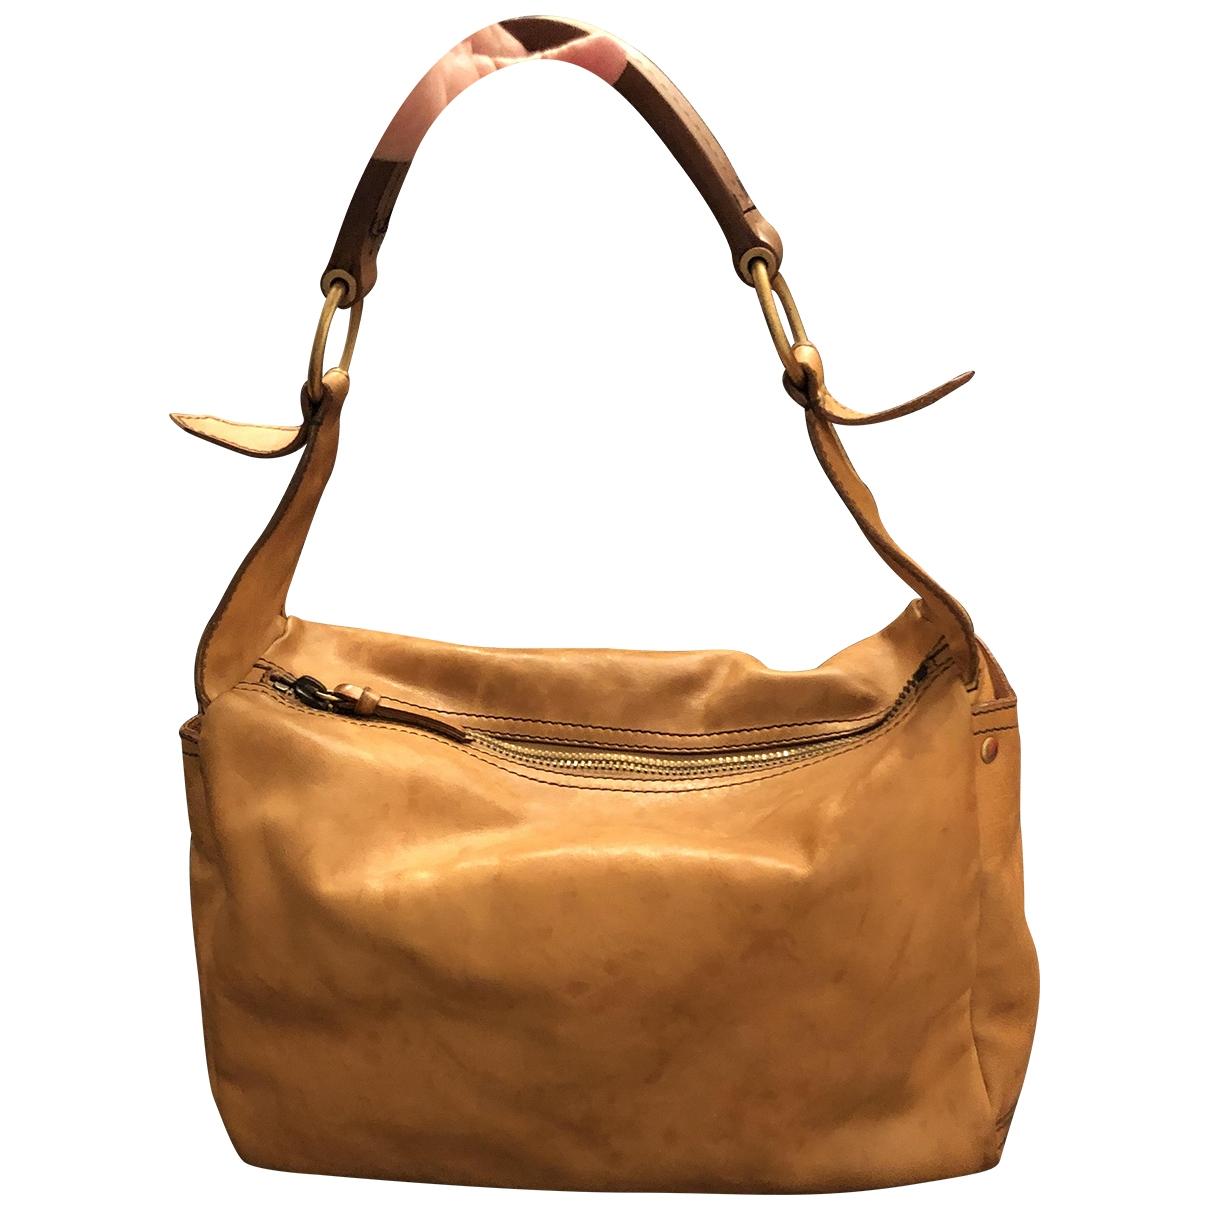 Miu Miu \N Orange Leather handbag for Women \N